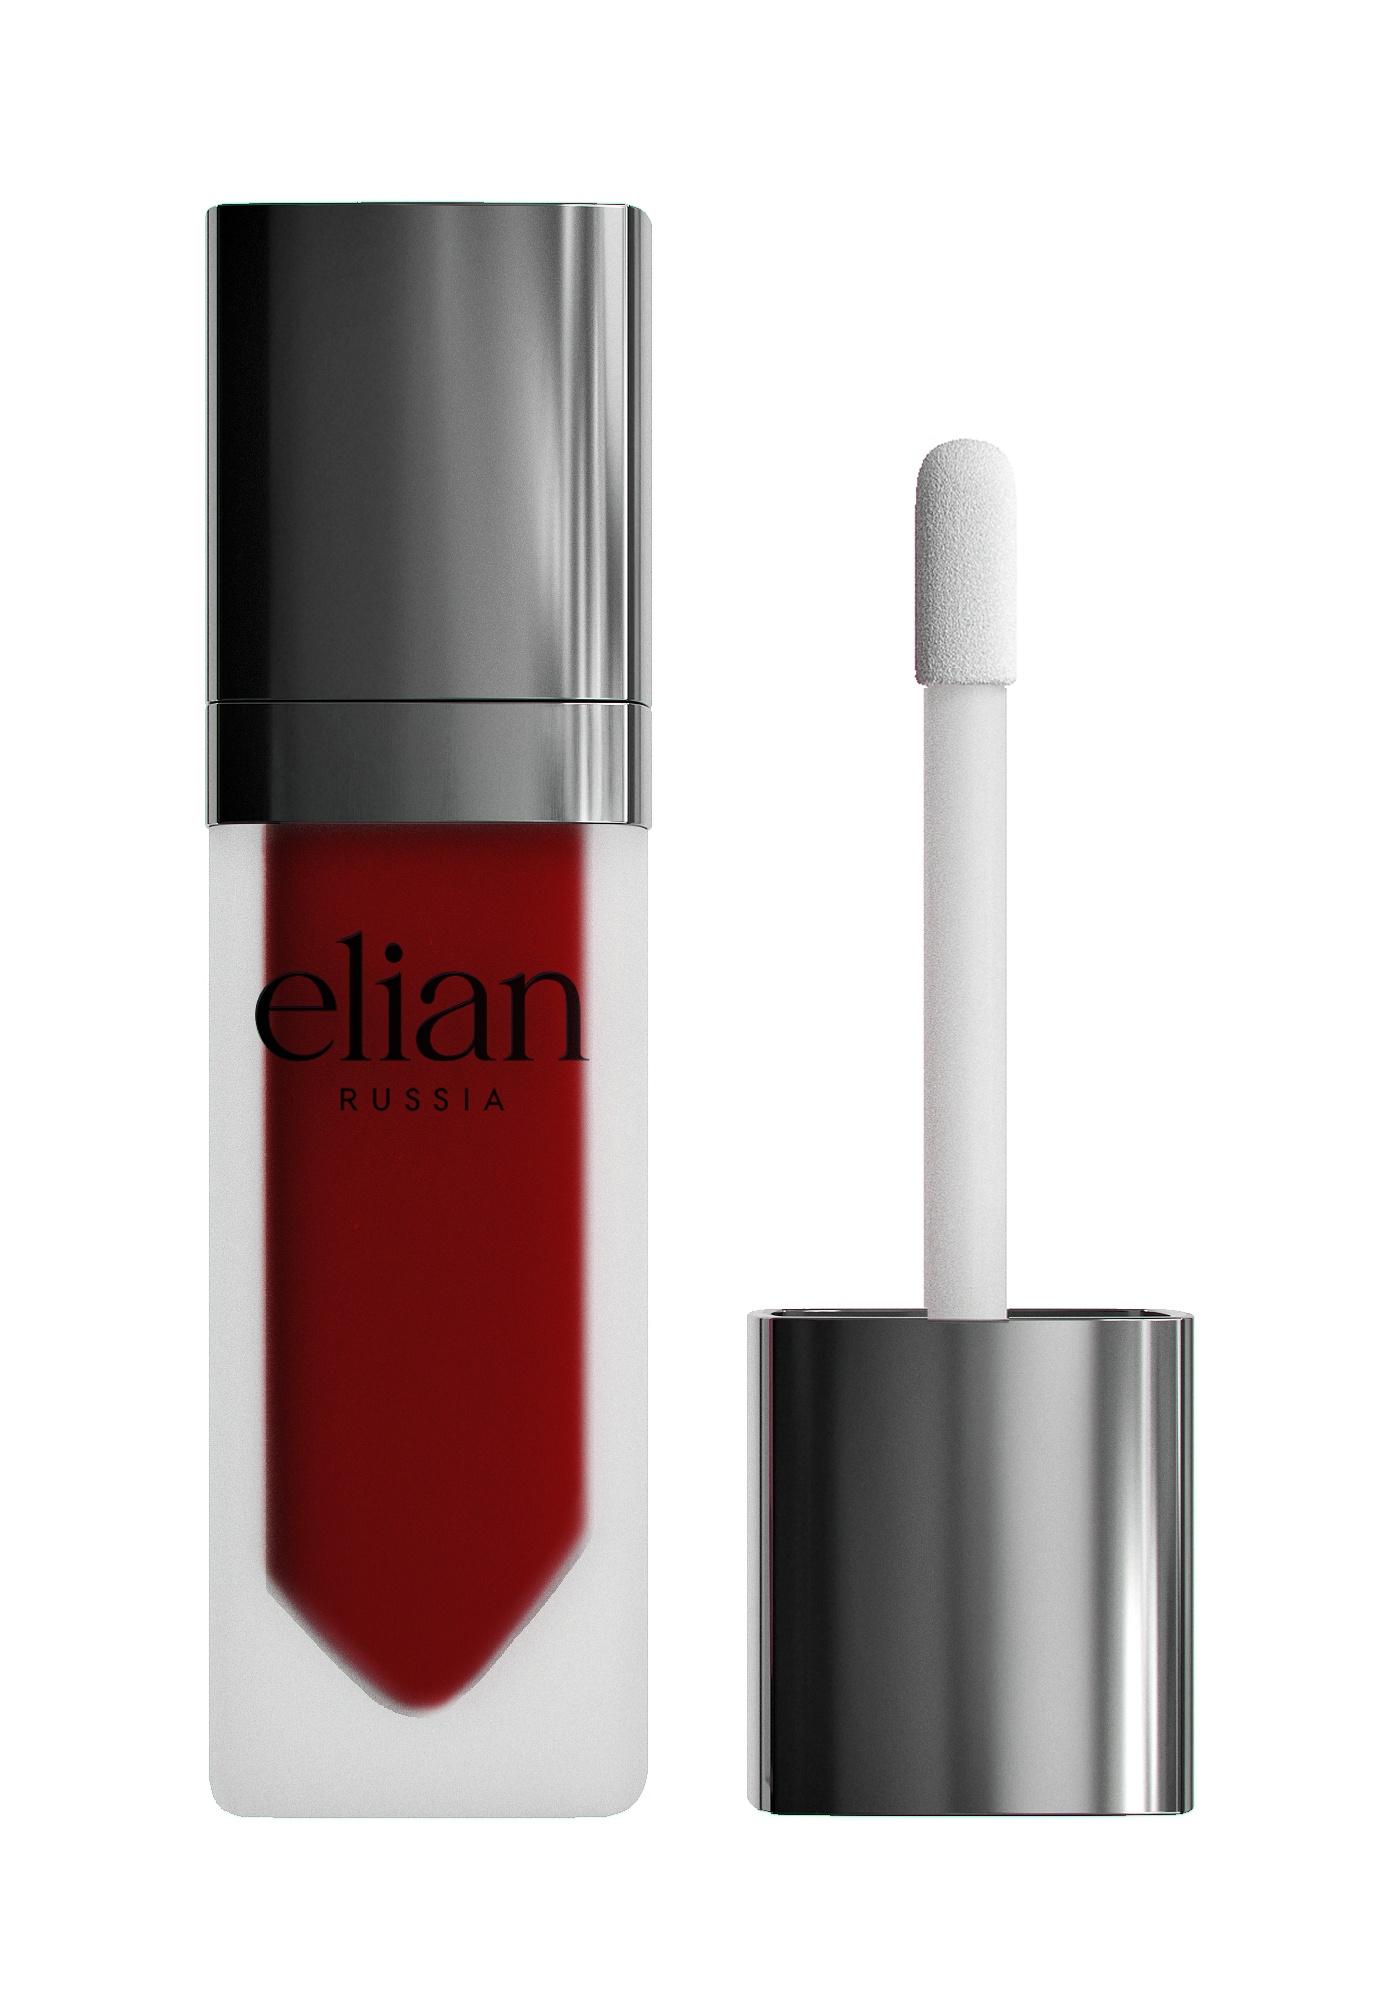 Жидкая матовая помада Superior matte liquid lipstick 612 Requiem ELIAN RUSSIA цена